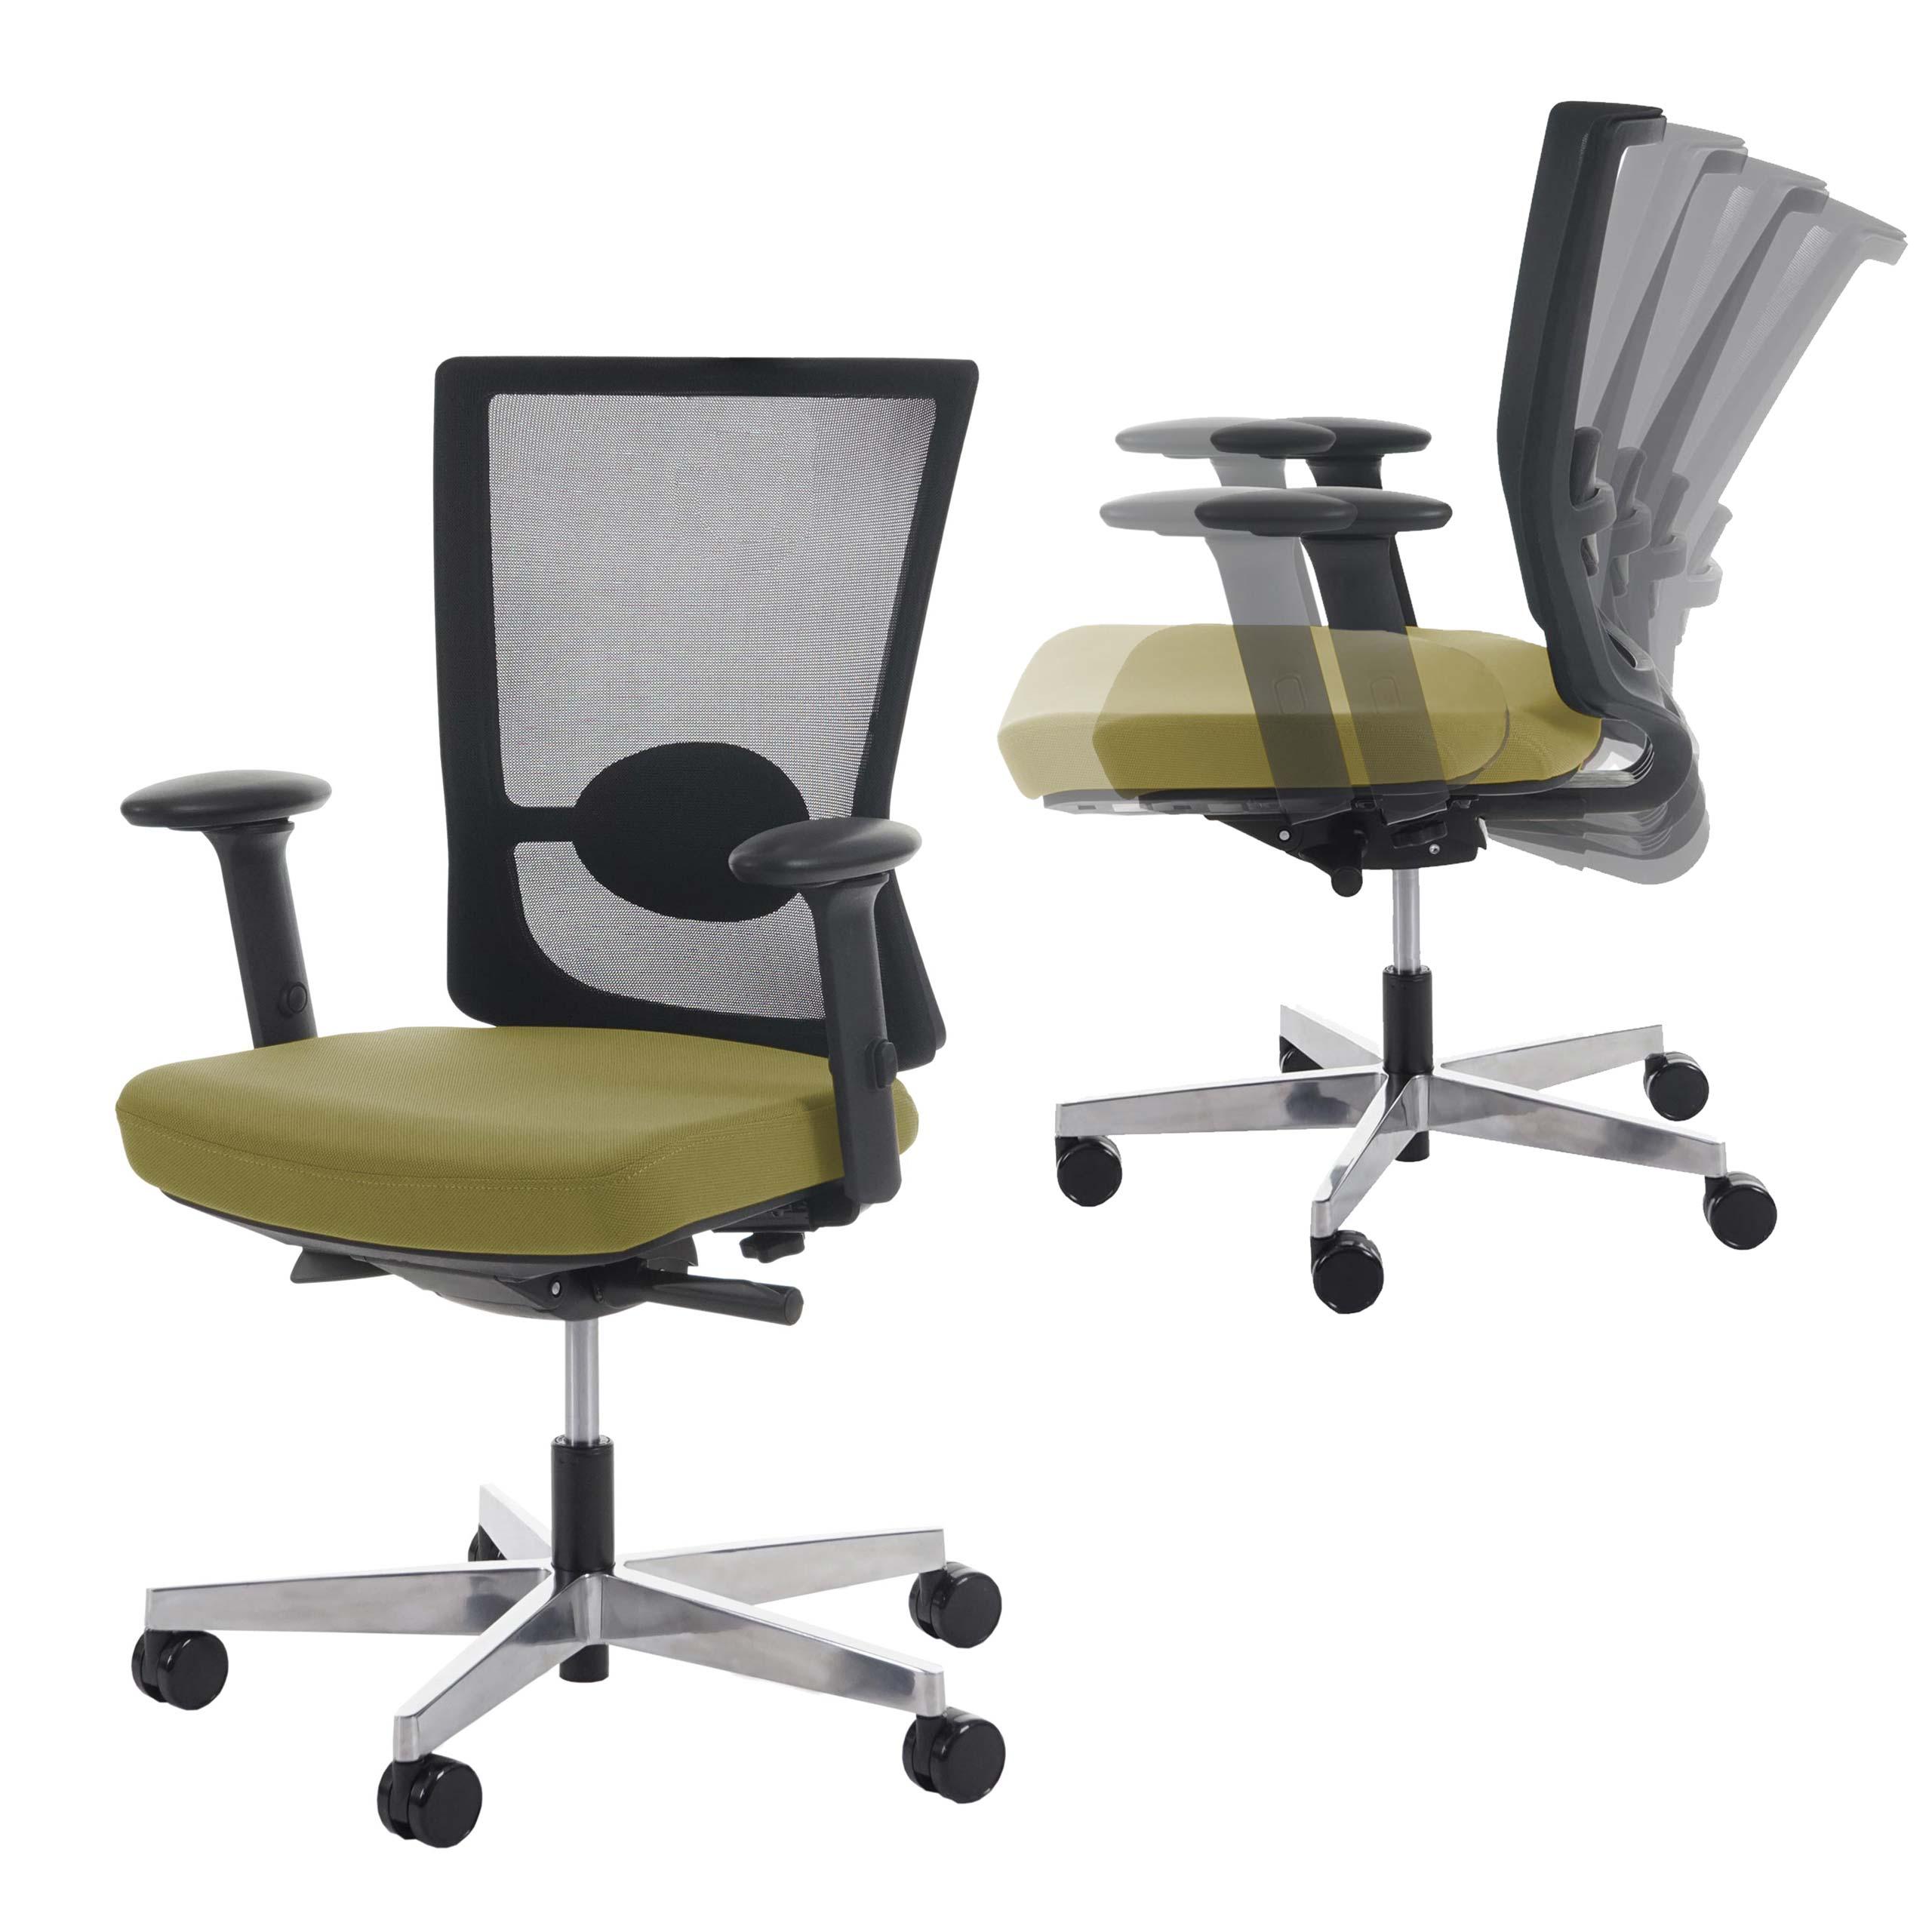 Drehstuhl ergonomisch  Bürostuhl Belfast, Schreibtischstuhl Drehstuhl, ergonomisch ~ olive